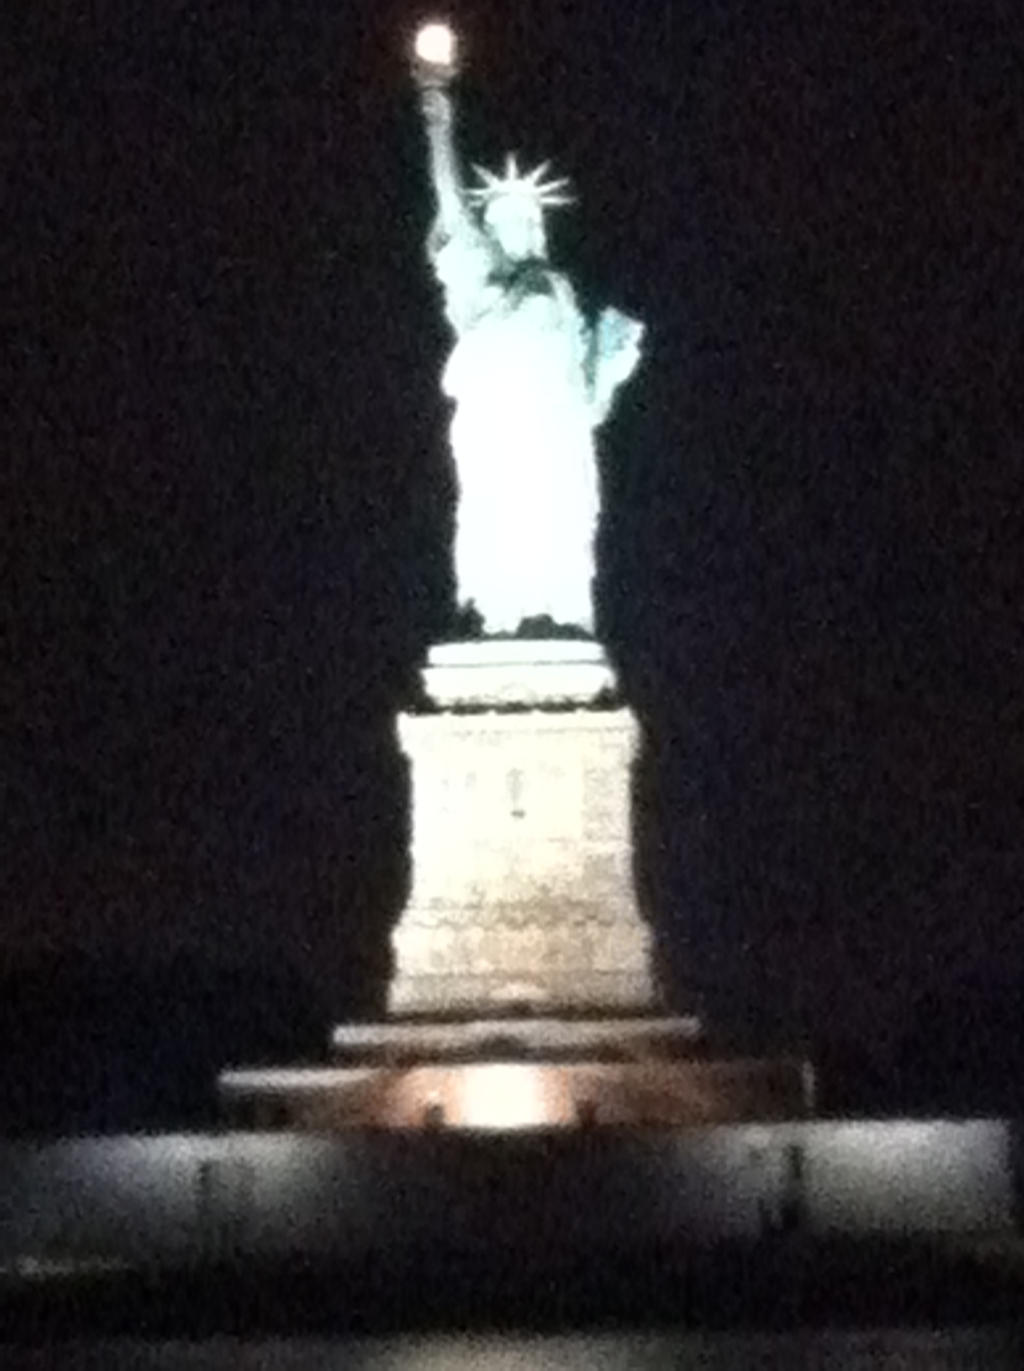 Lady Liberty In her Glory by Transformerbrett97